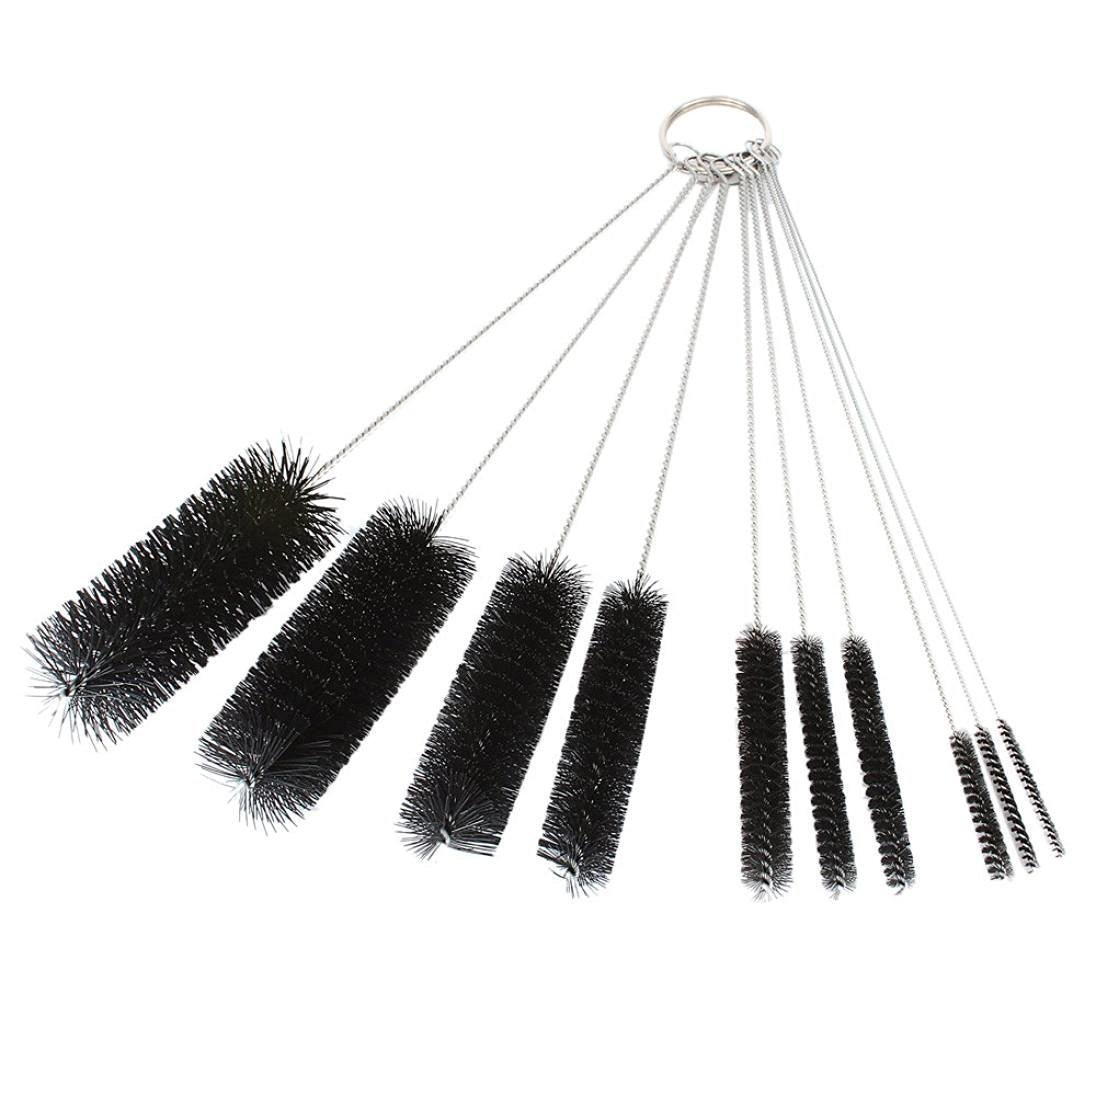 Dxg 8.2 Inch Nylon Tube Brush Set Cleaning Brush Set for Drinking Straws, Glasses, Keyboards, Jewelry Cleaning, Set of 10 Brush-01